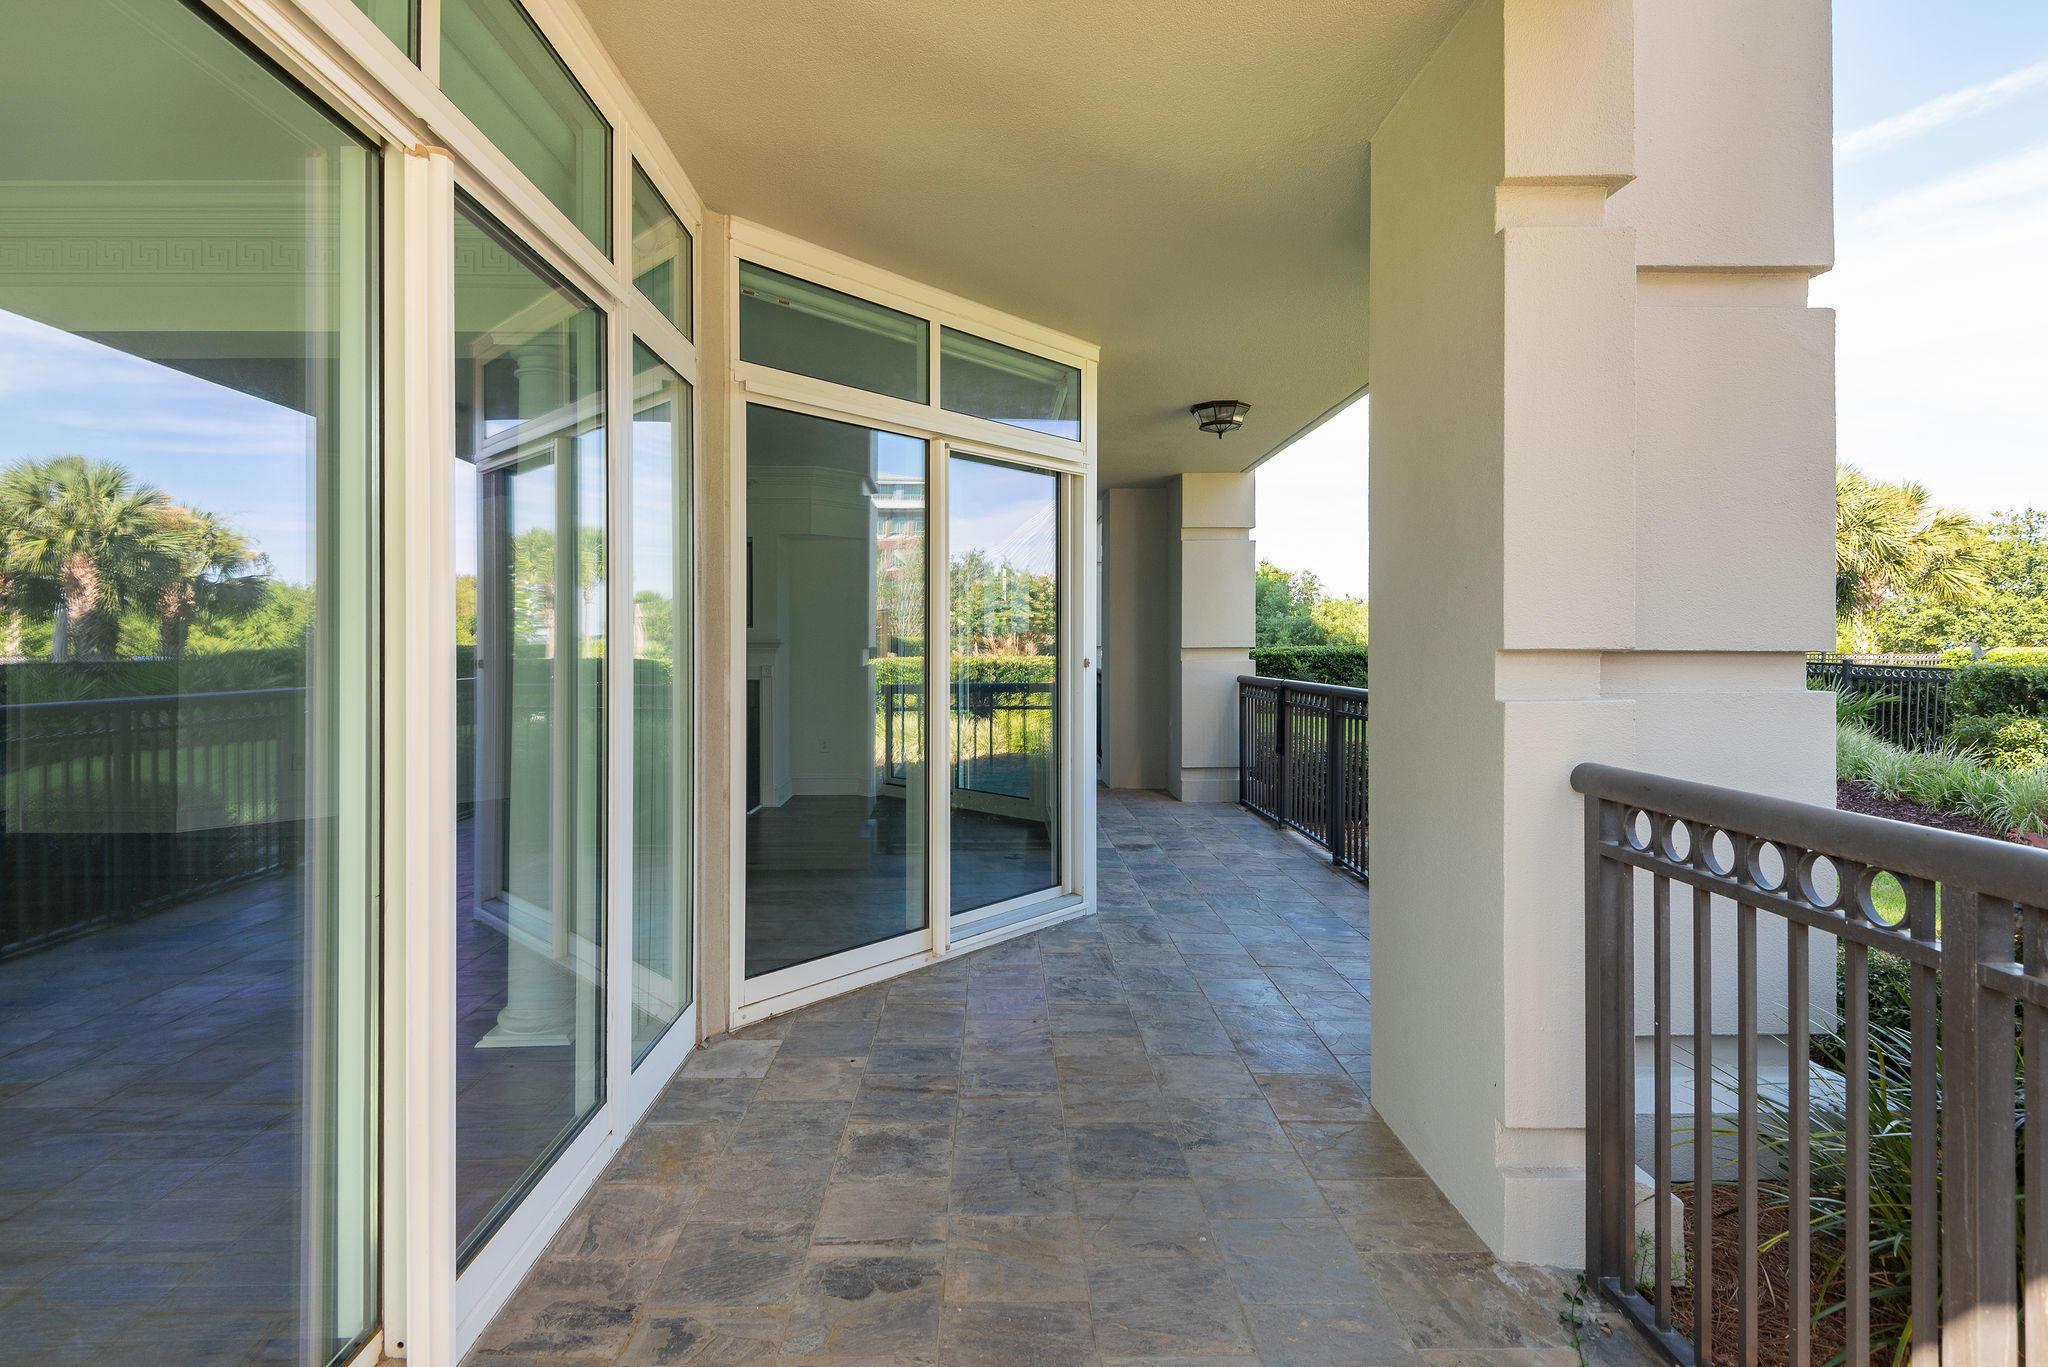 Renaissance On Chas Harbor Homes For Sale - 211 Plaza, Mount Pleasant, SC - 32